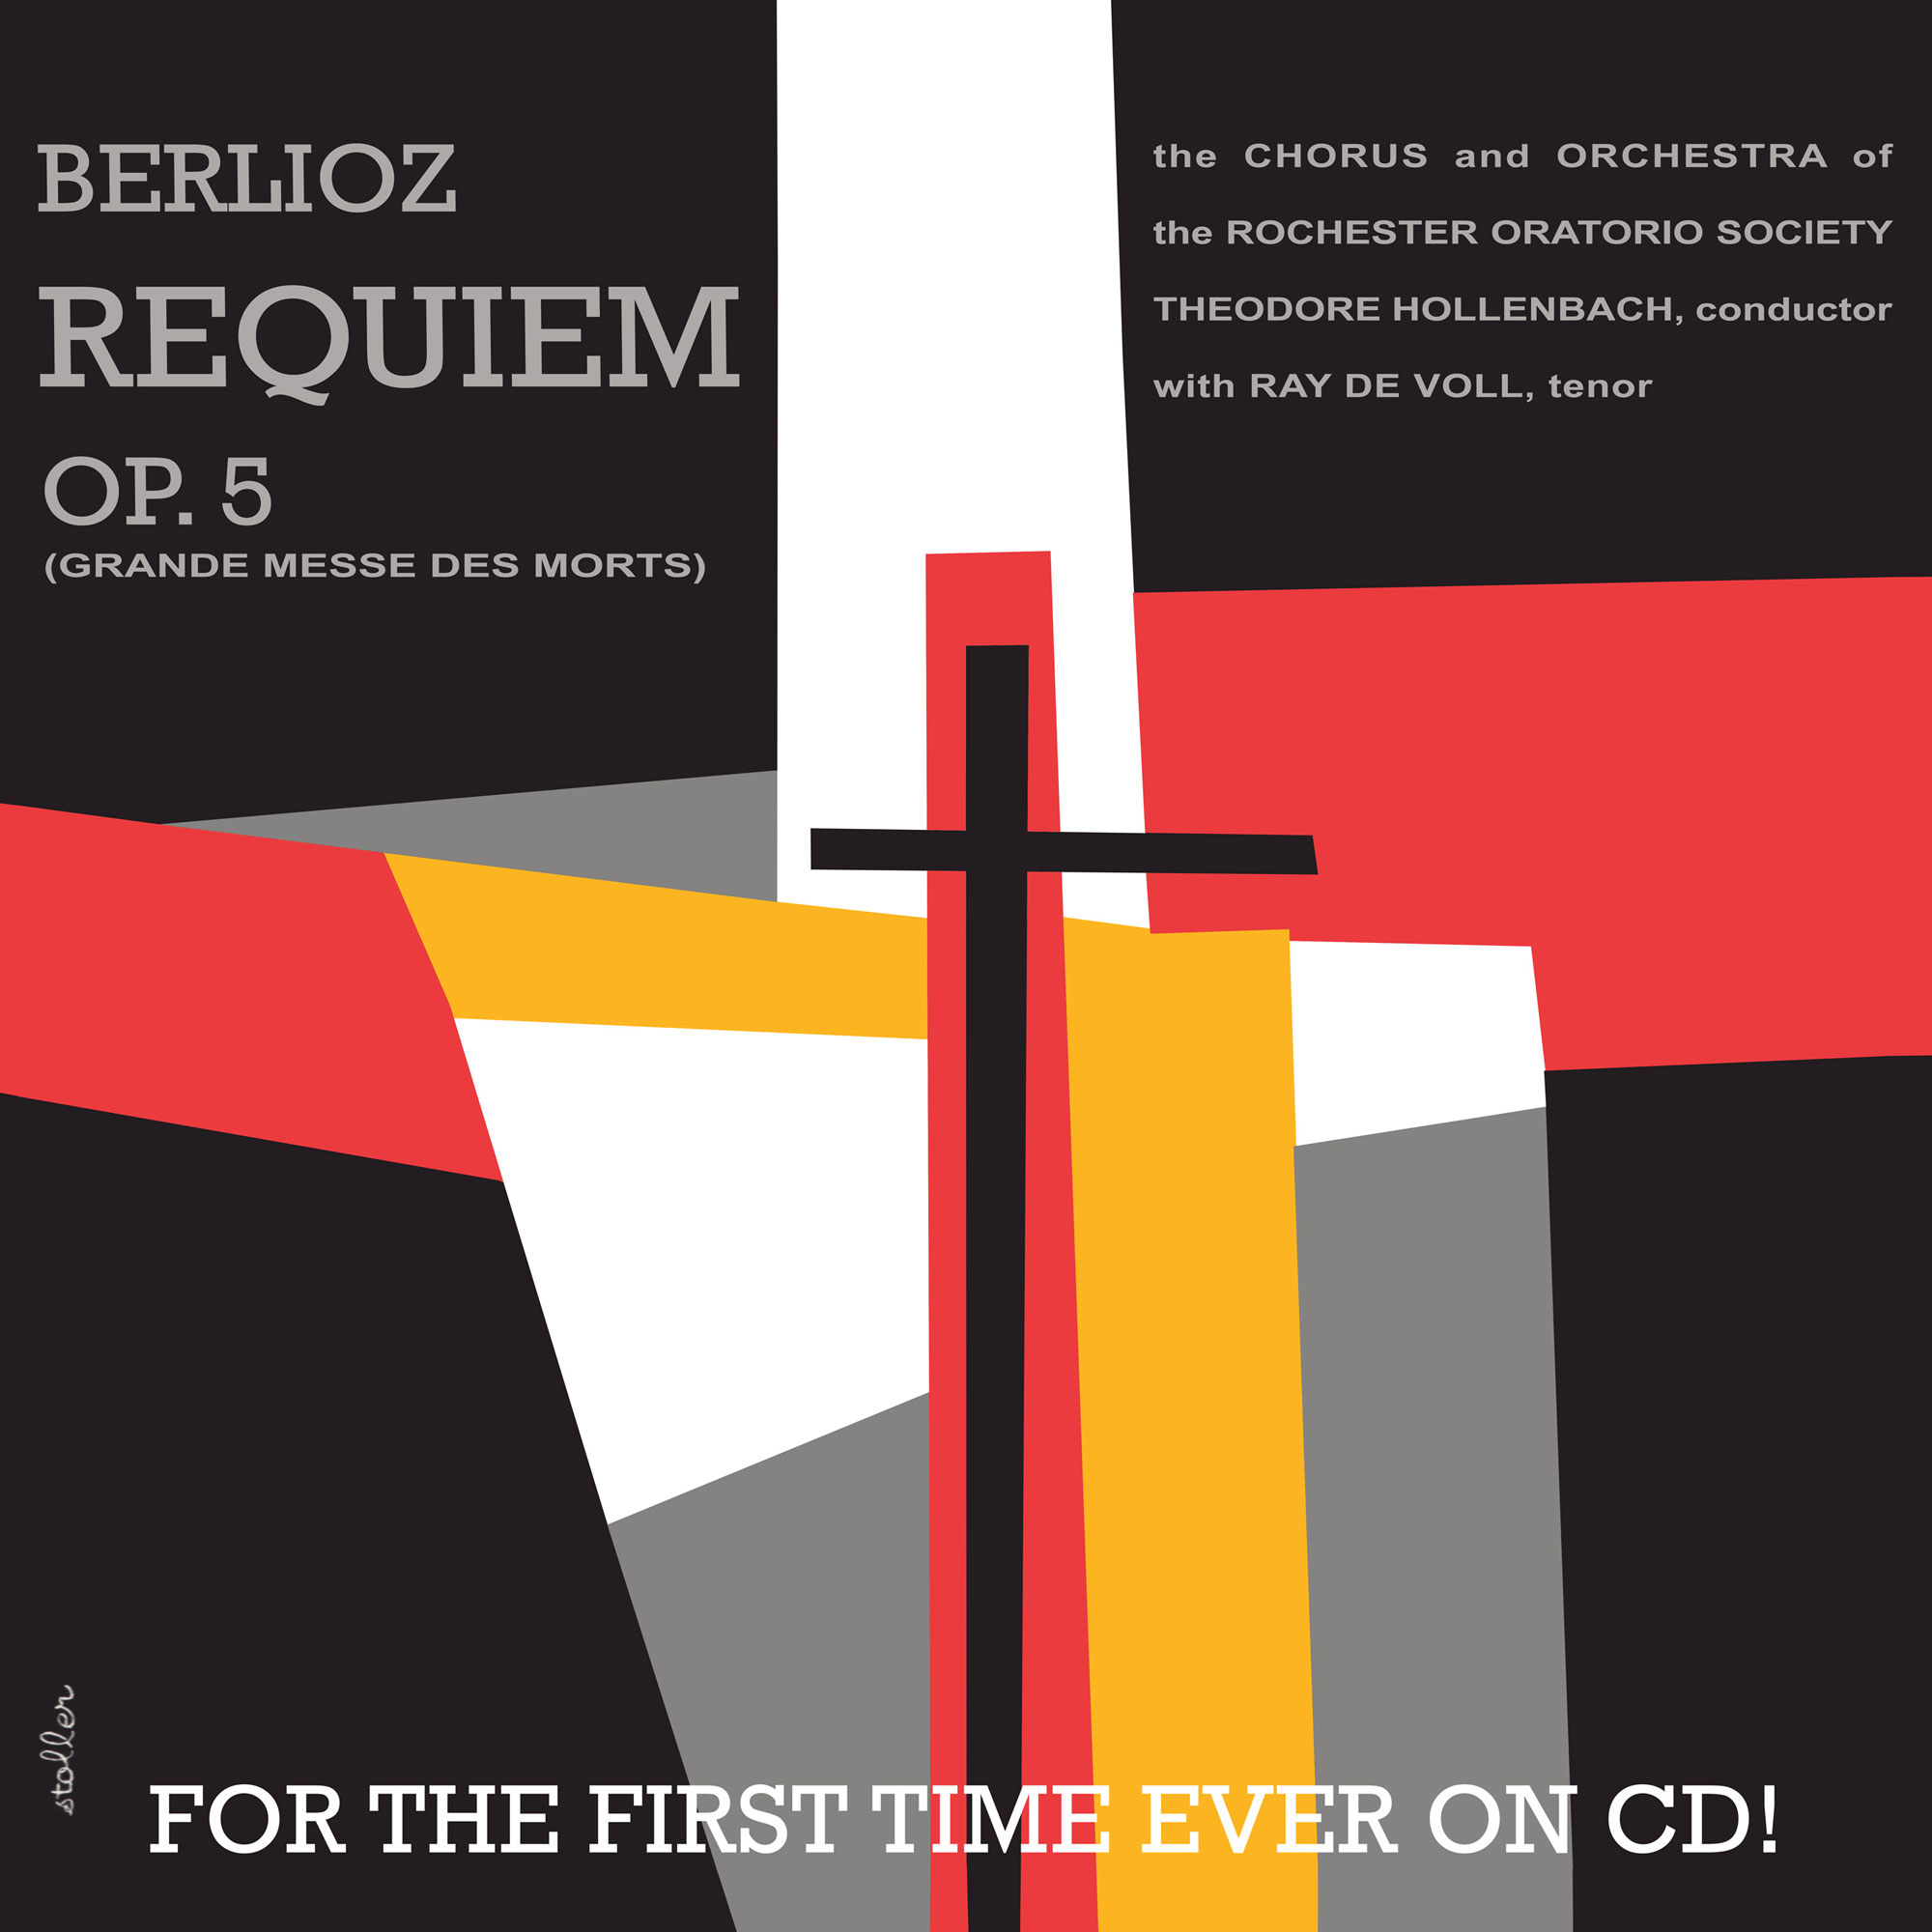 REQUIEM, Op  5 (Grande Messe des Morts) - Rossings